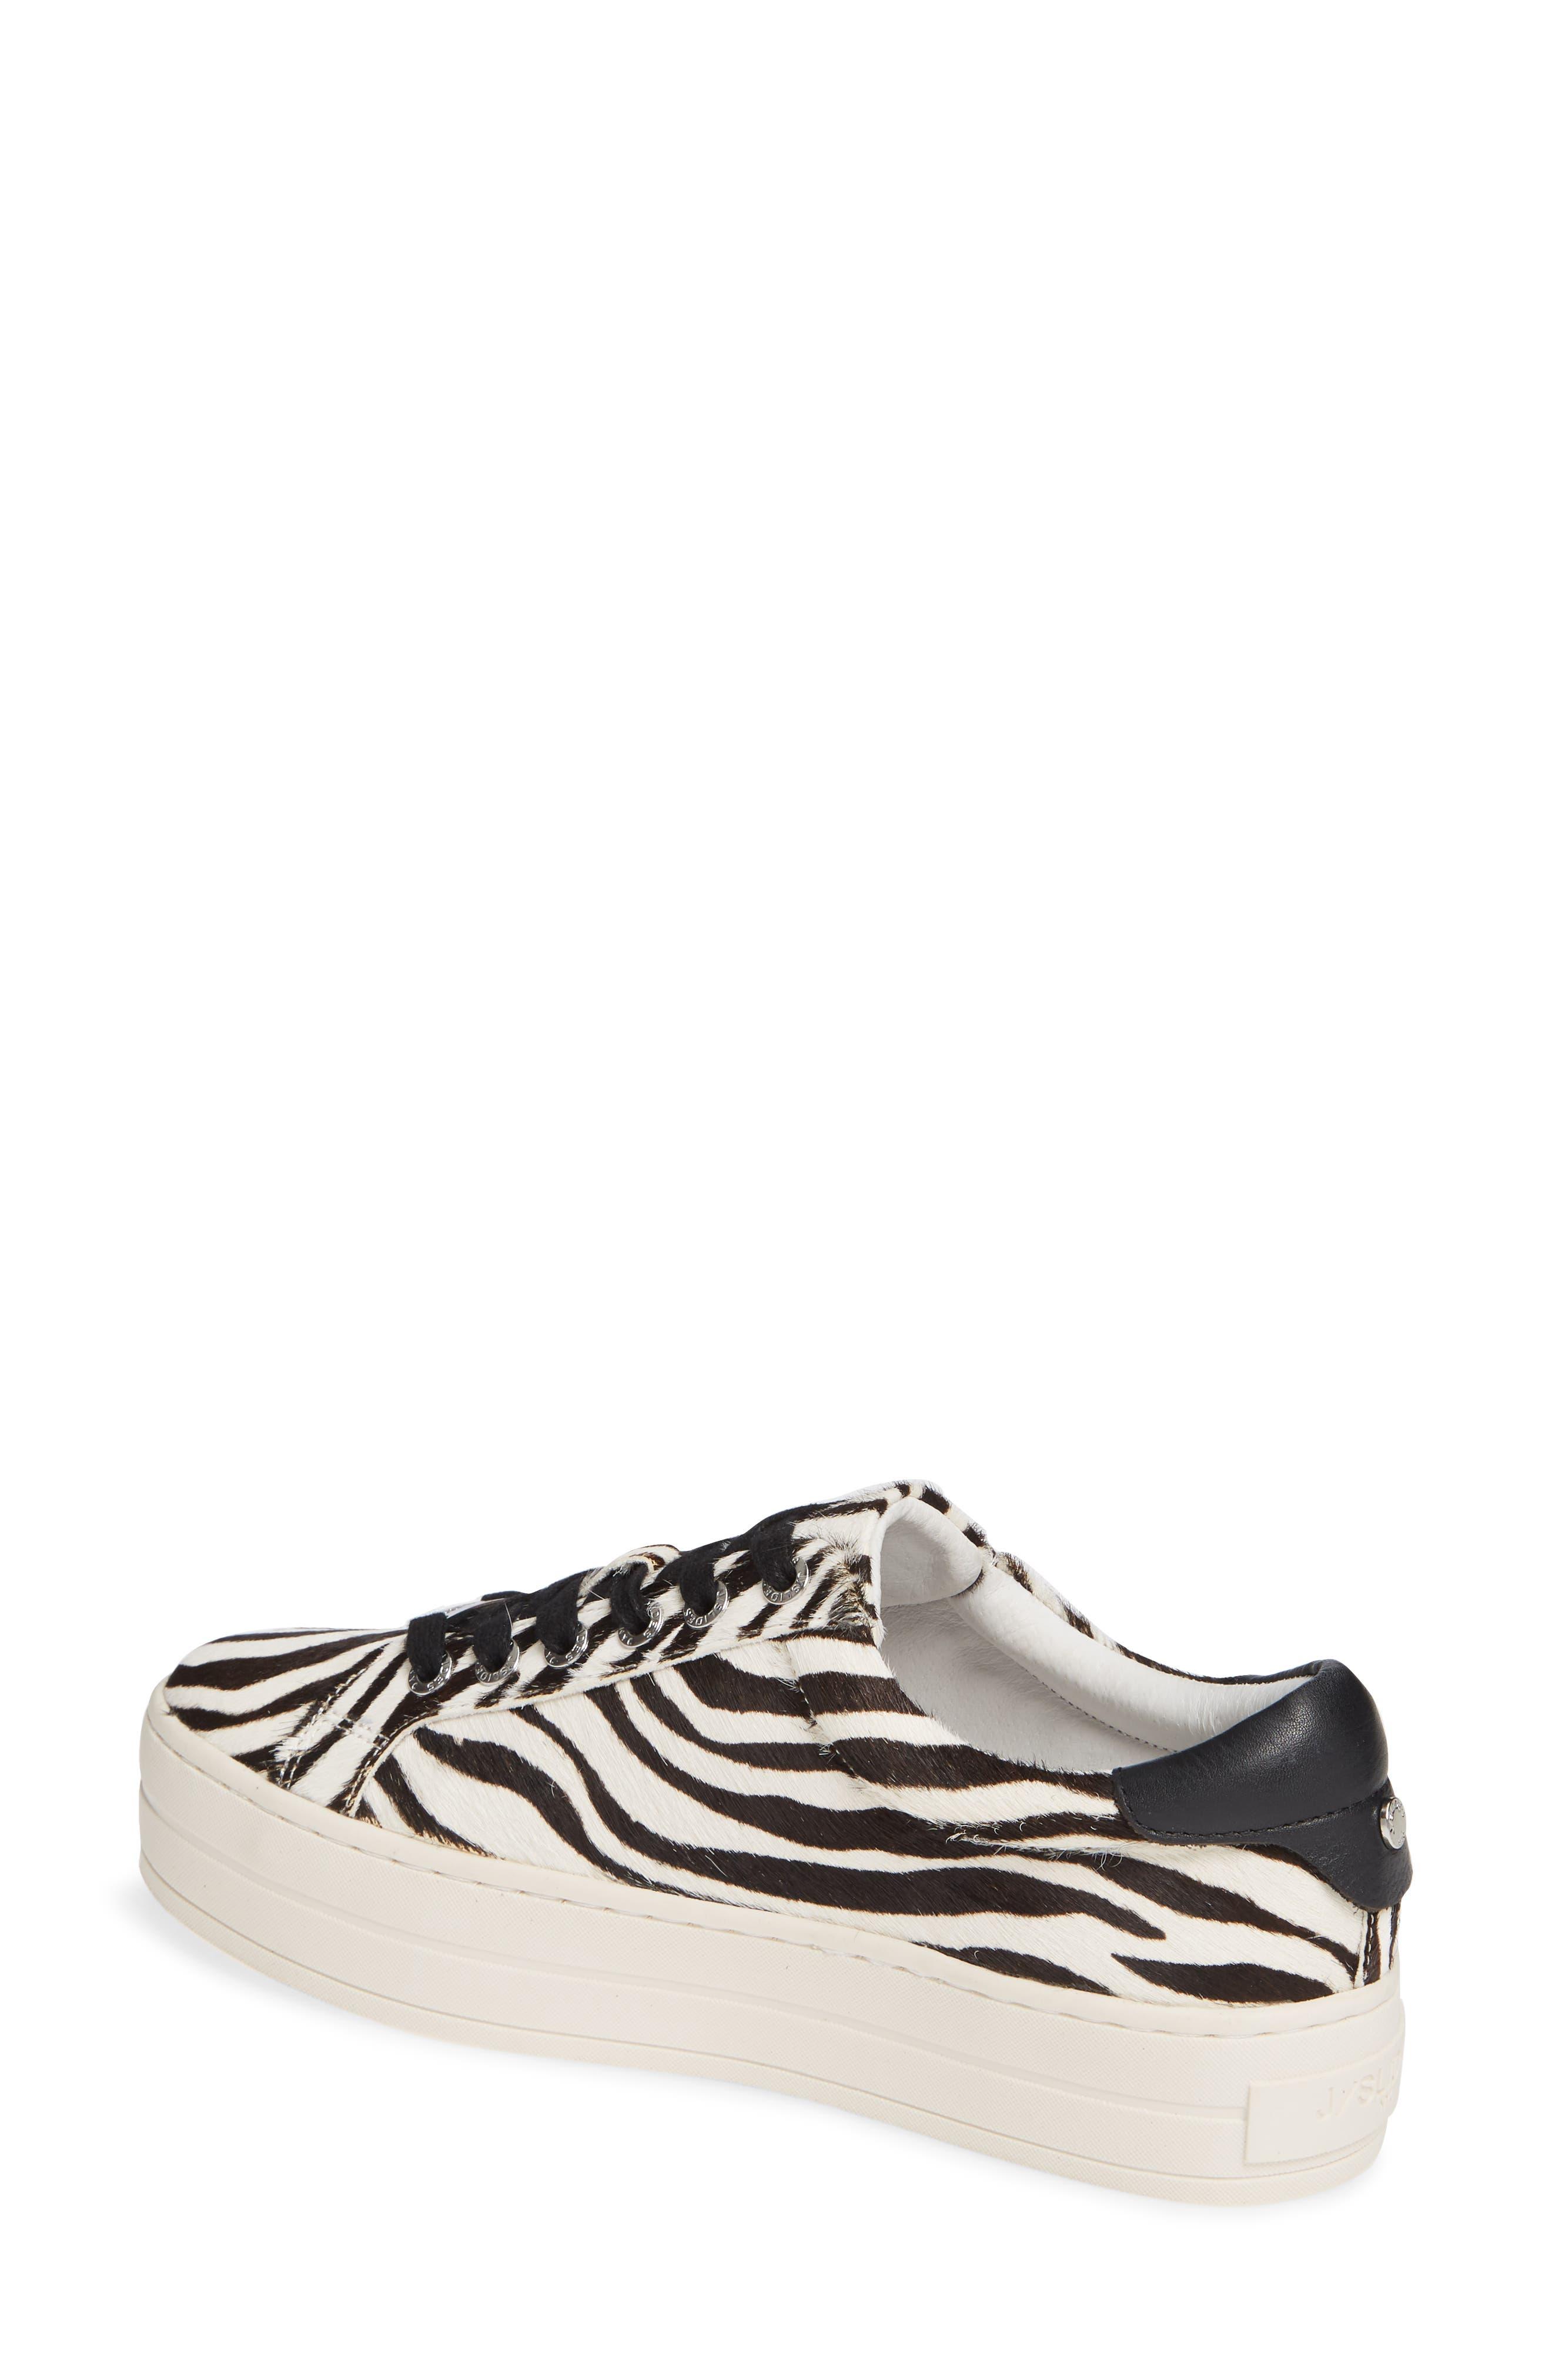 JSLIDES,                             Hippie Genuine Calf Hair Platform Sneaker,                             Alternate thumbnail 2, color,                             ZEBRA CALF HAIR